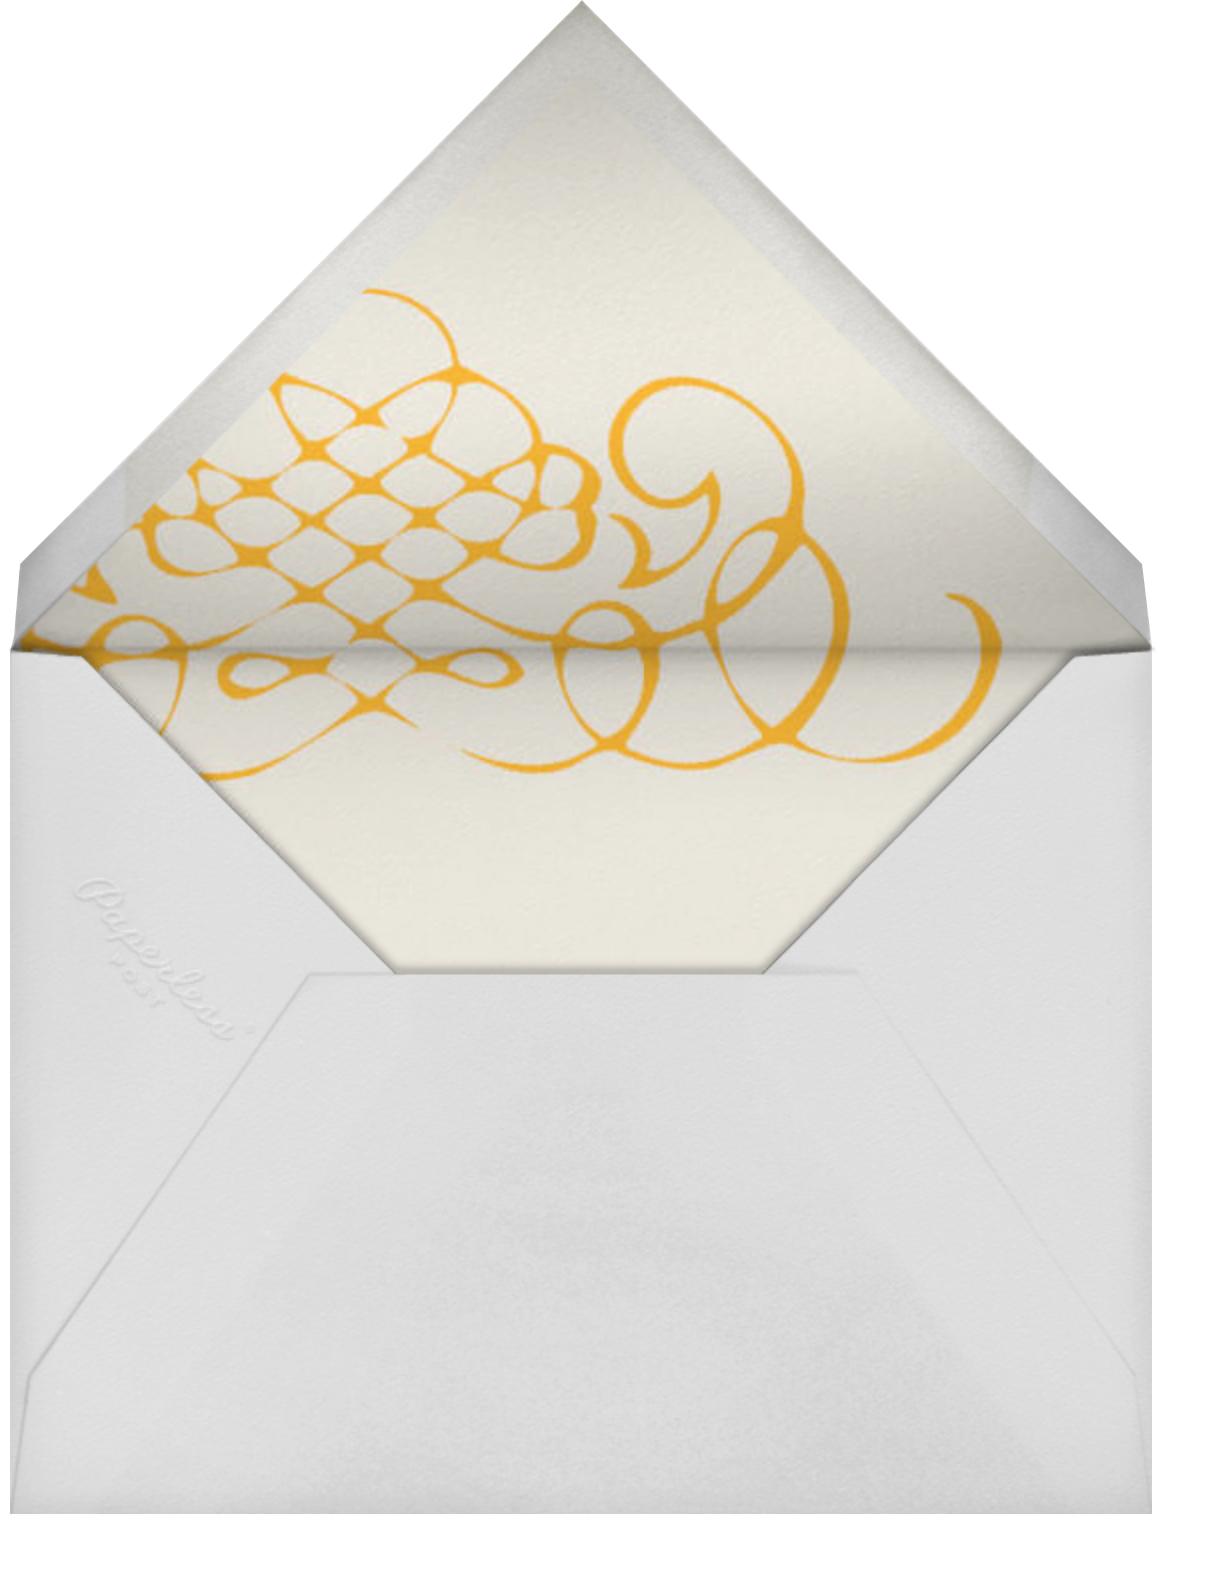 Antique Press- Cream with Mango (Horizontal) - Paperless Post - Envelope